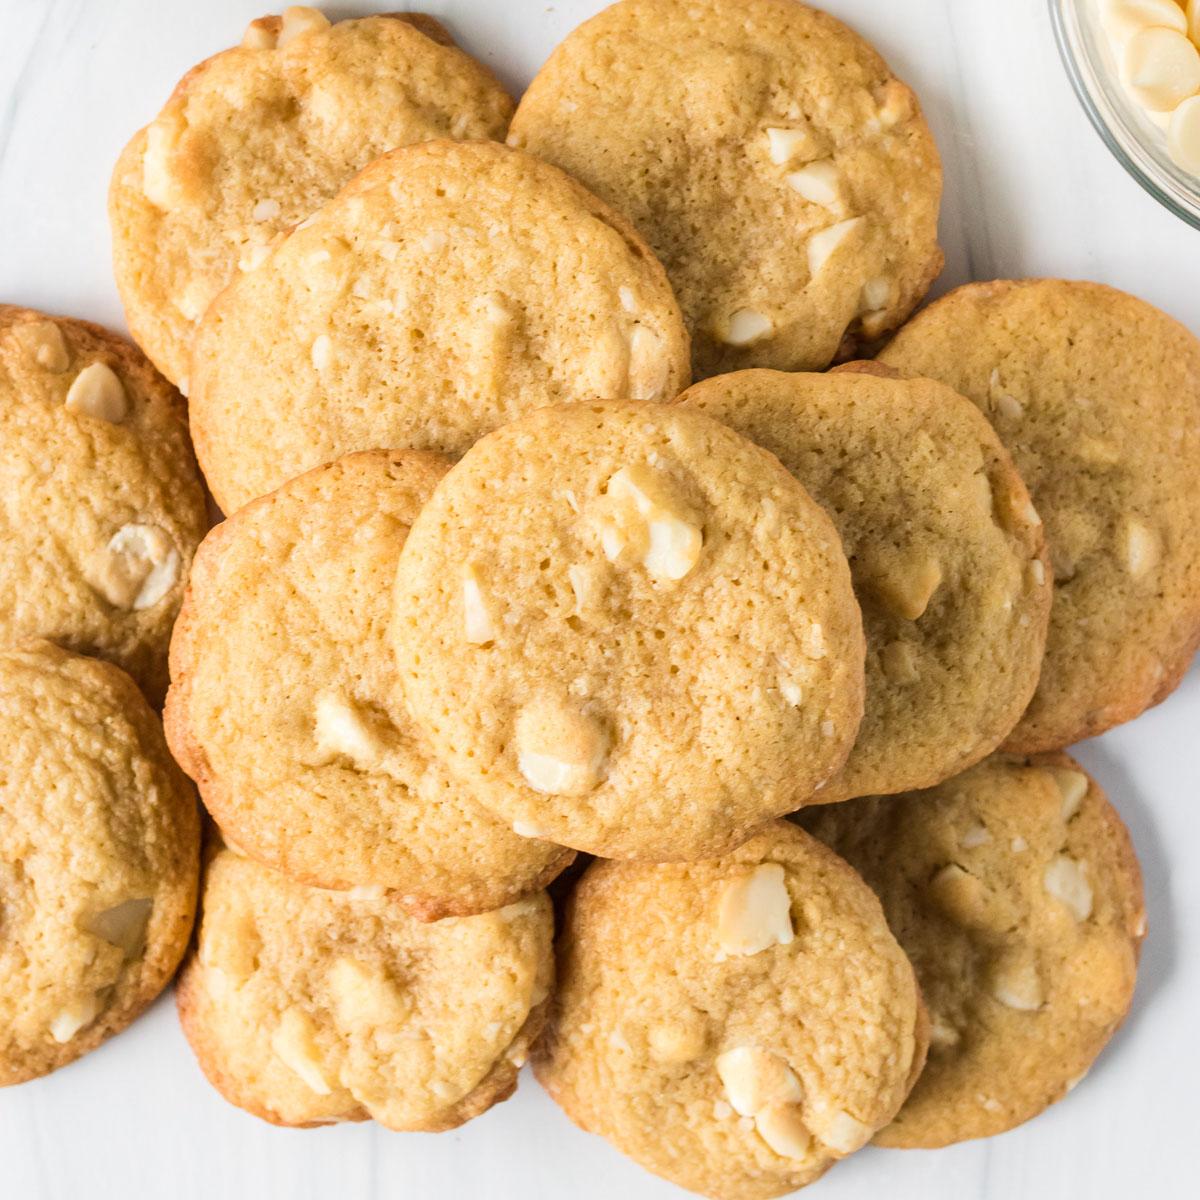 platter of white chocolate macadamia nut cookies